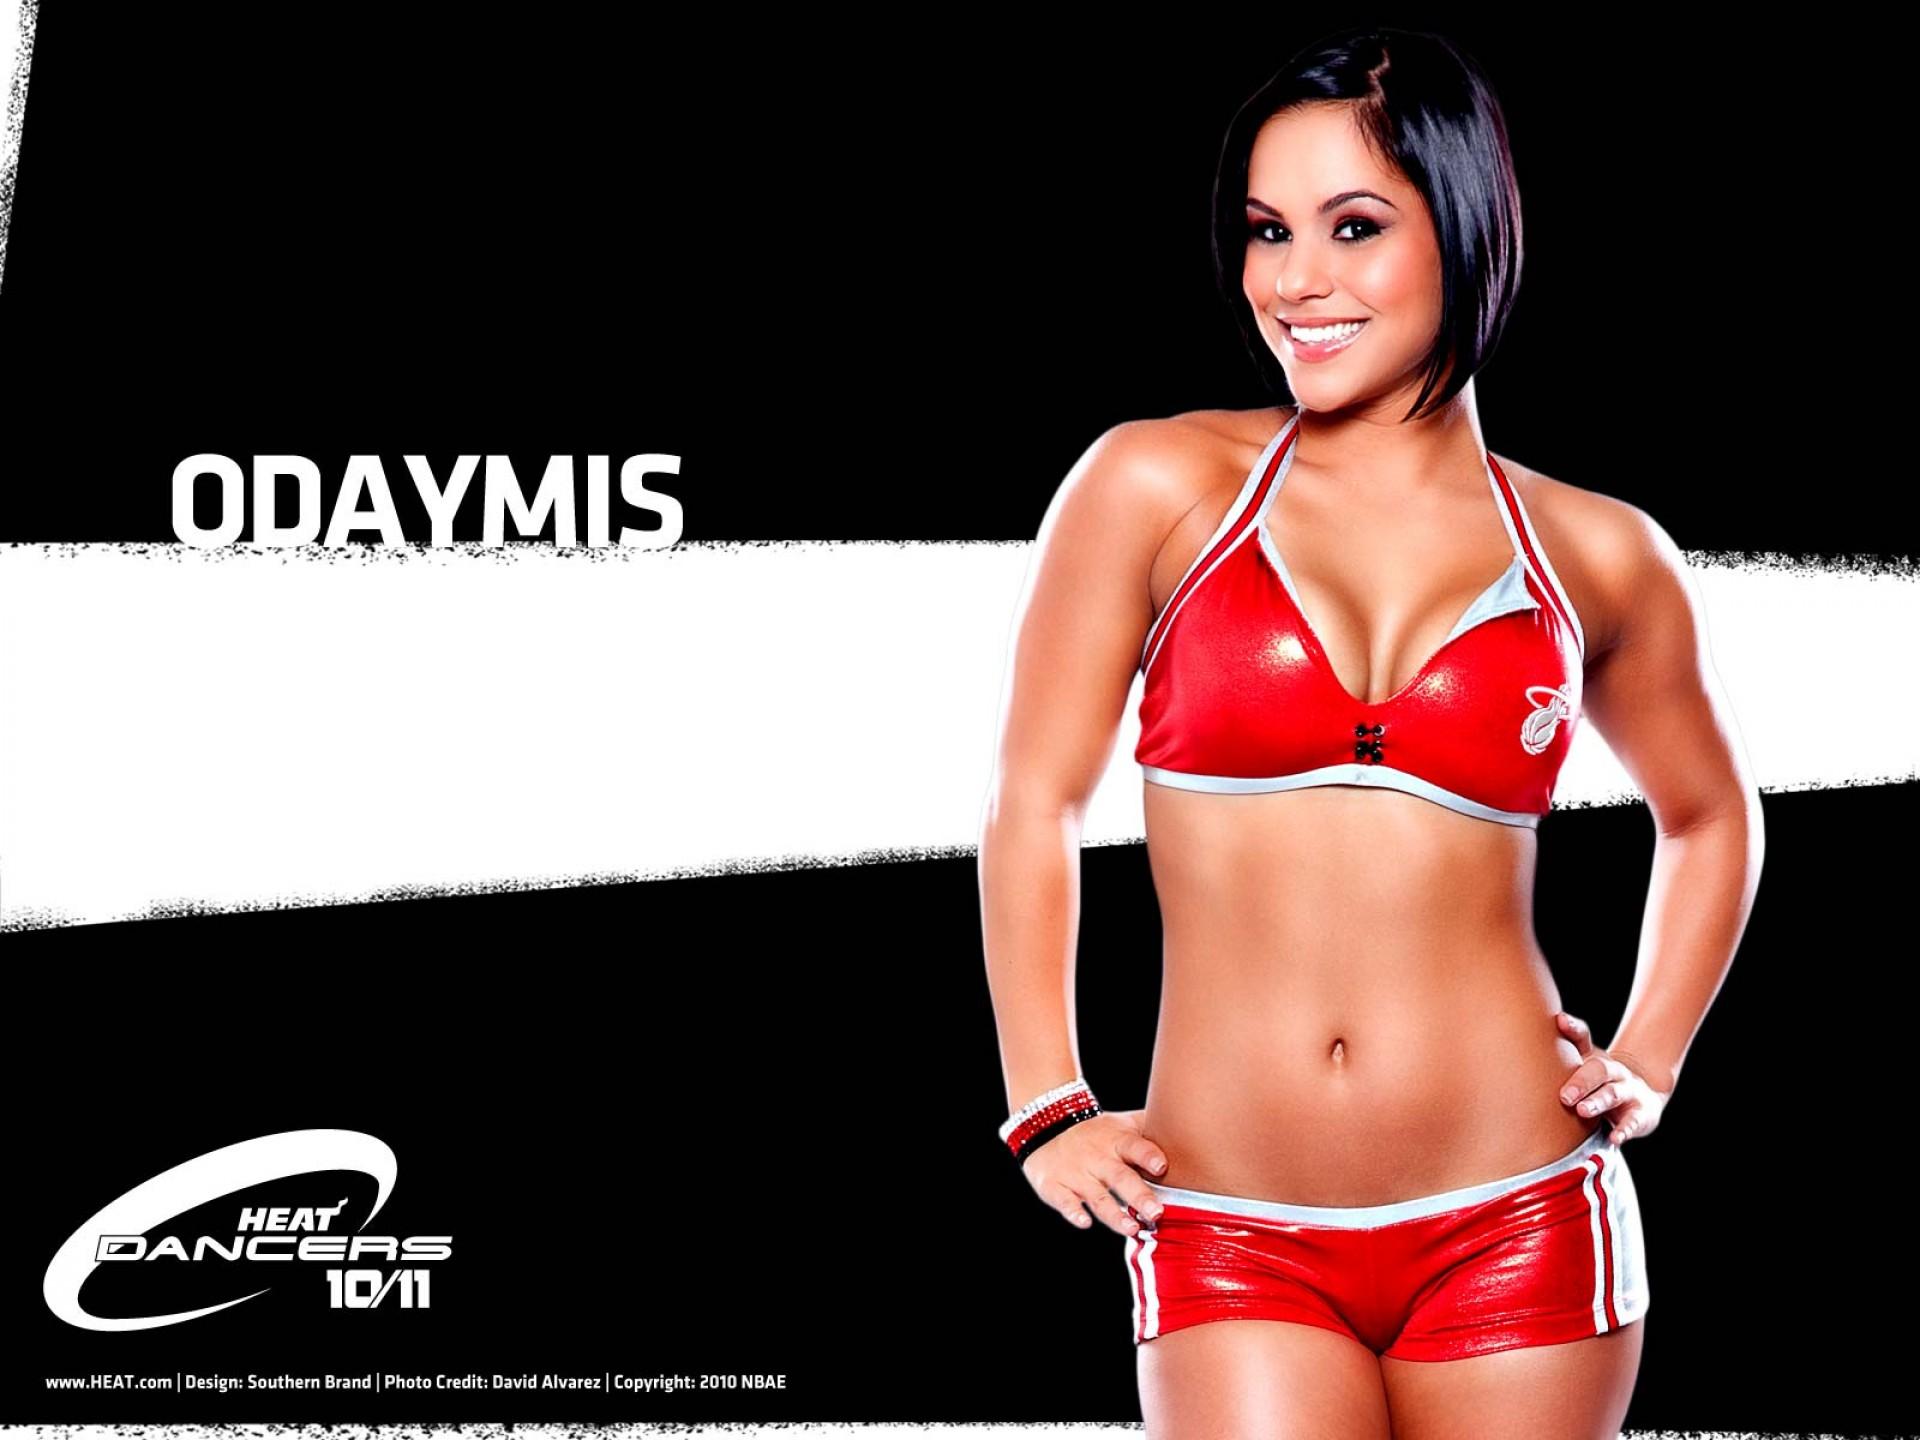 Miami Heat Nba Dancers Odaymis United States Usa HD Wallpaper